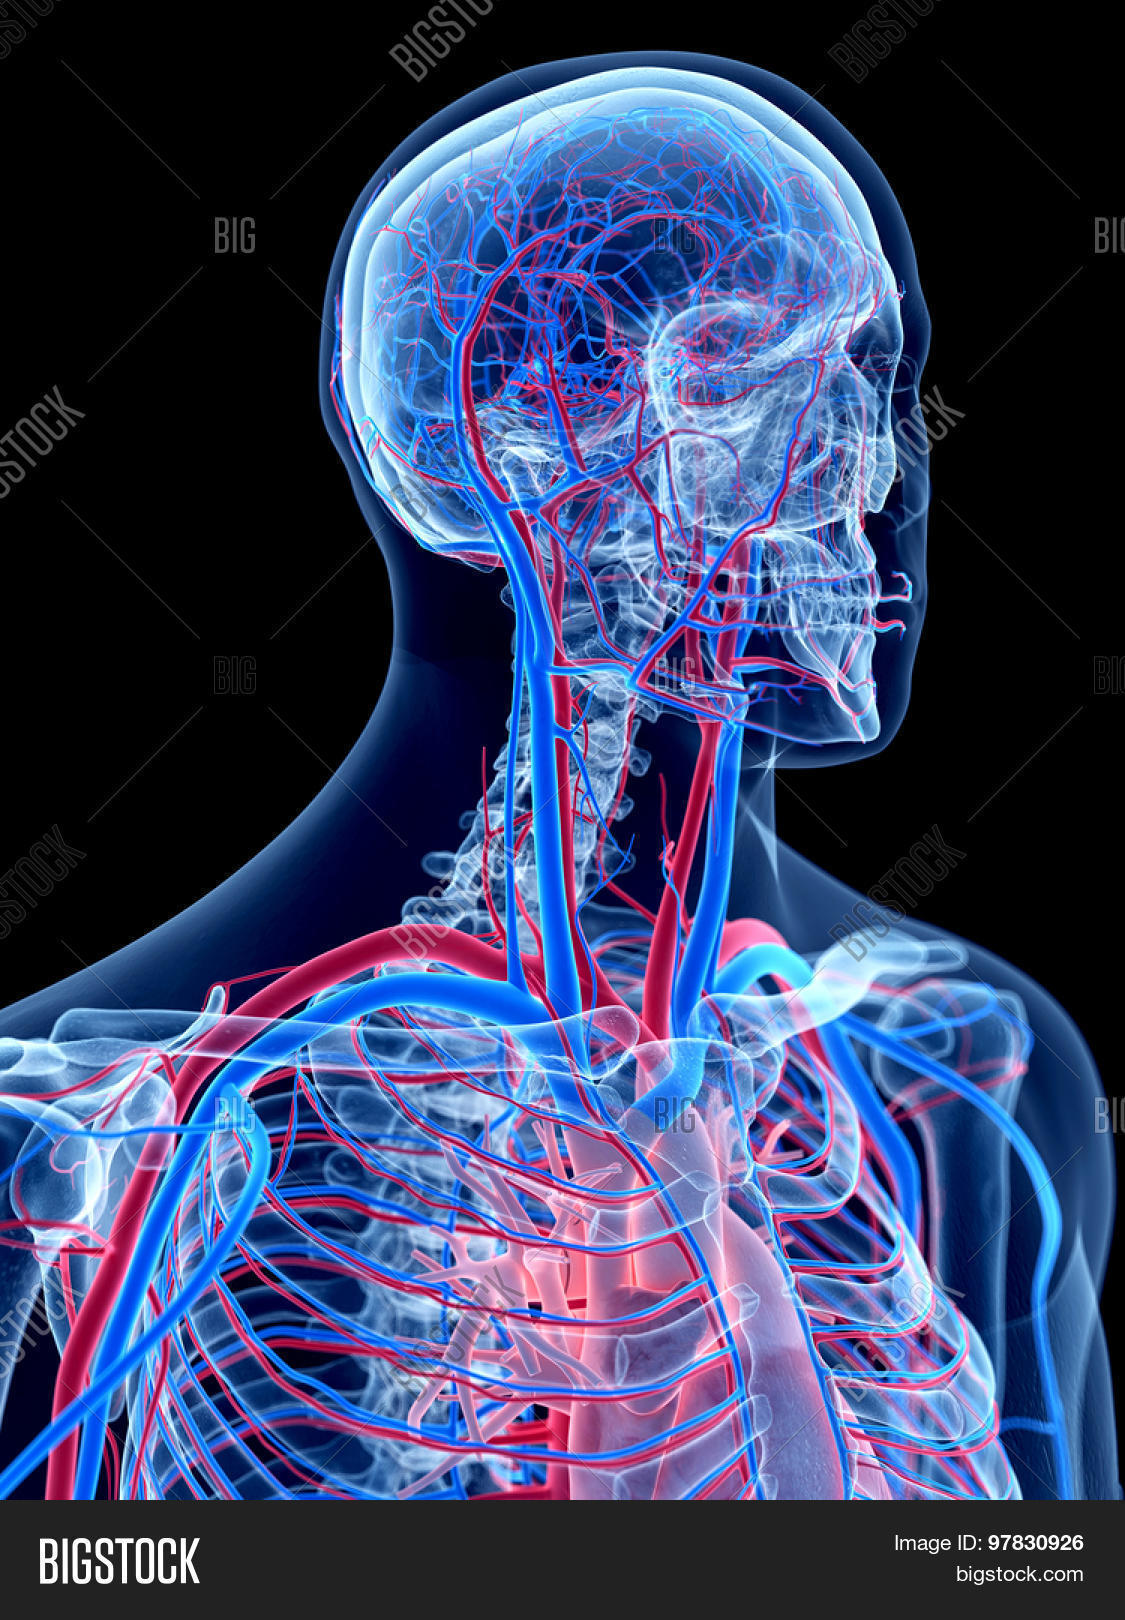 Human Vascular System Image Photo Free Trial Bigstock